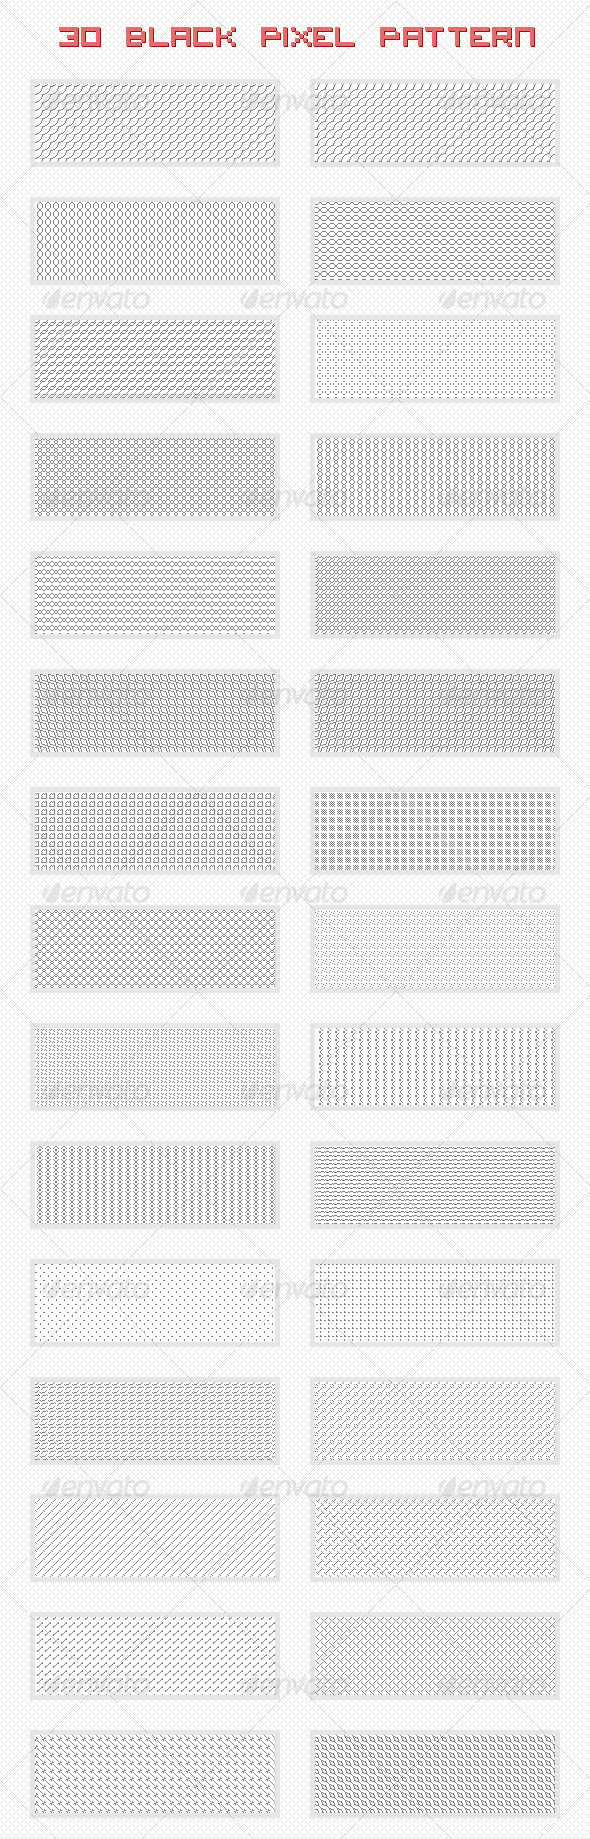 GraphicRiver Black Pixel Patterns 4836135